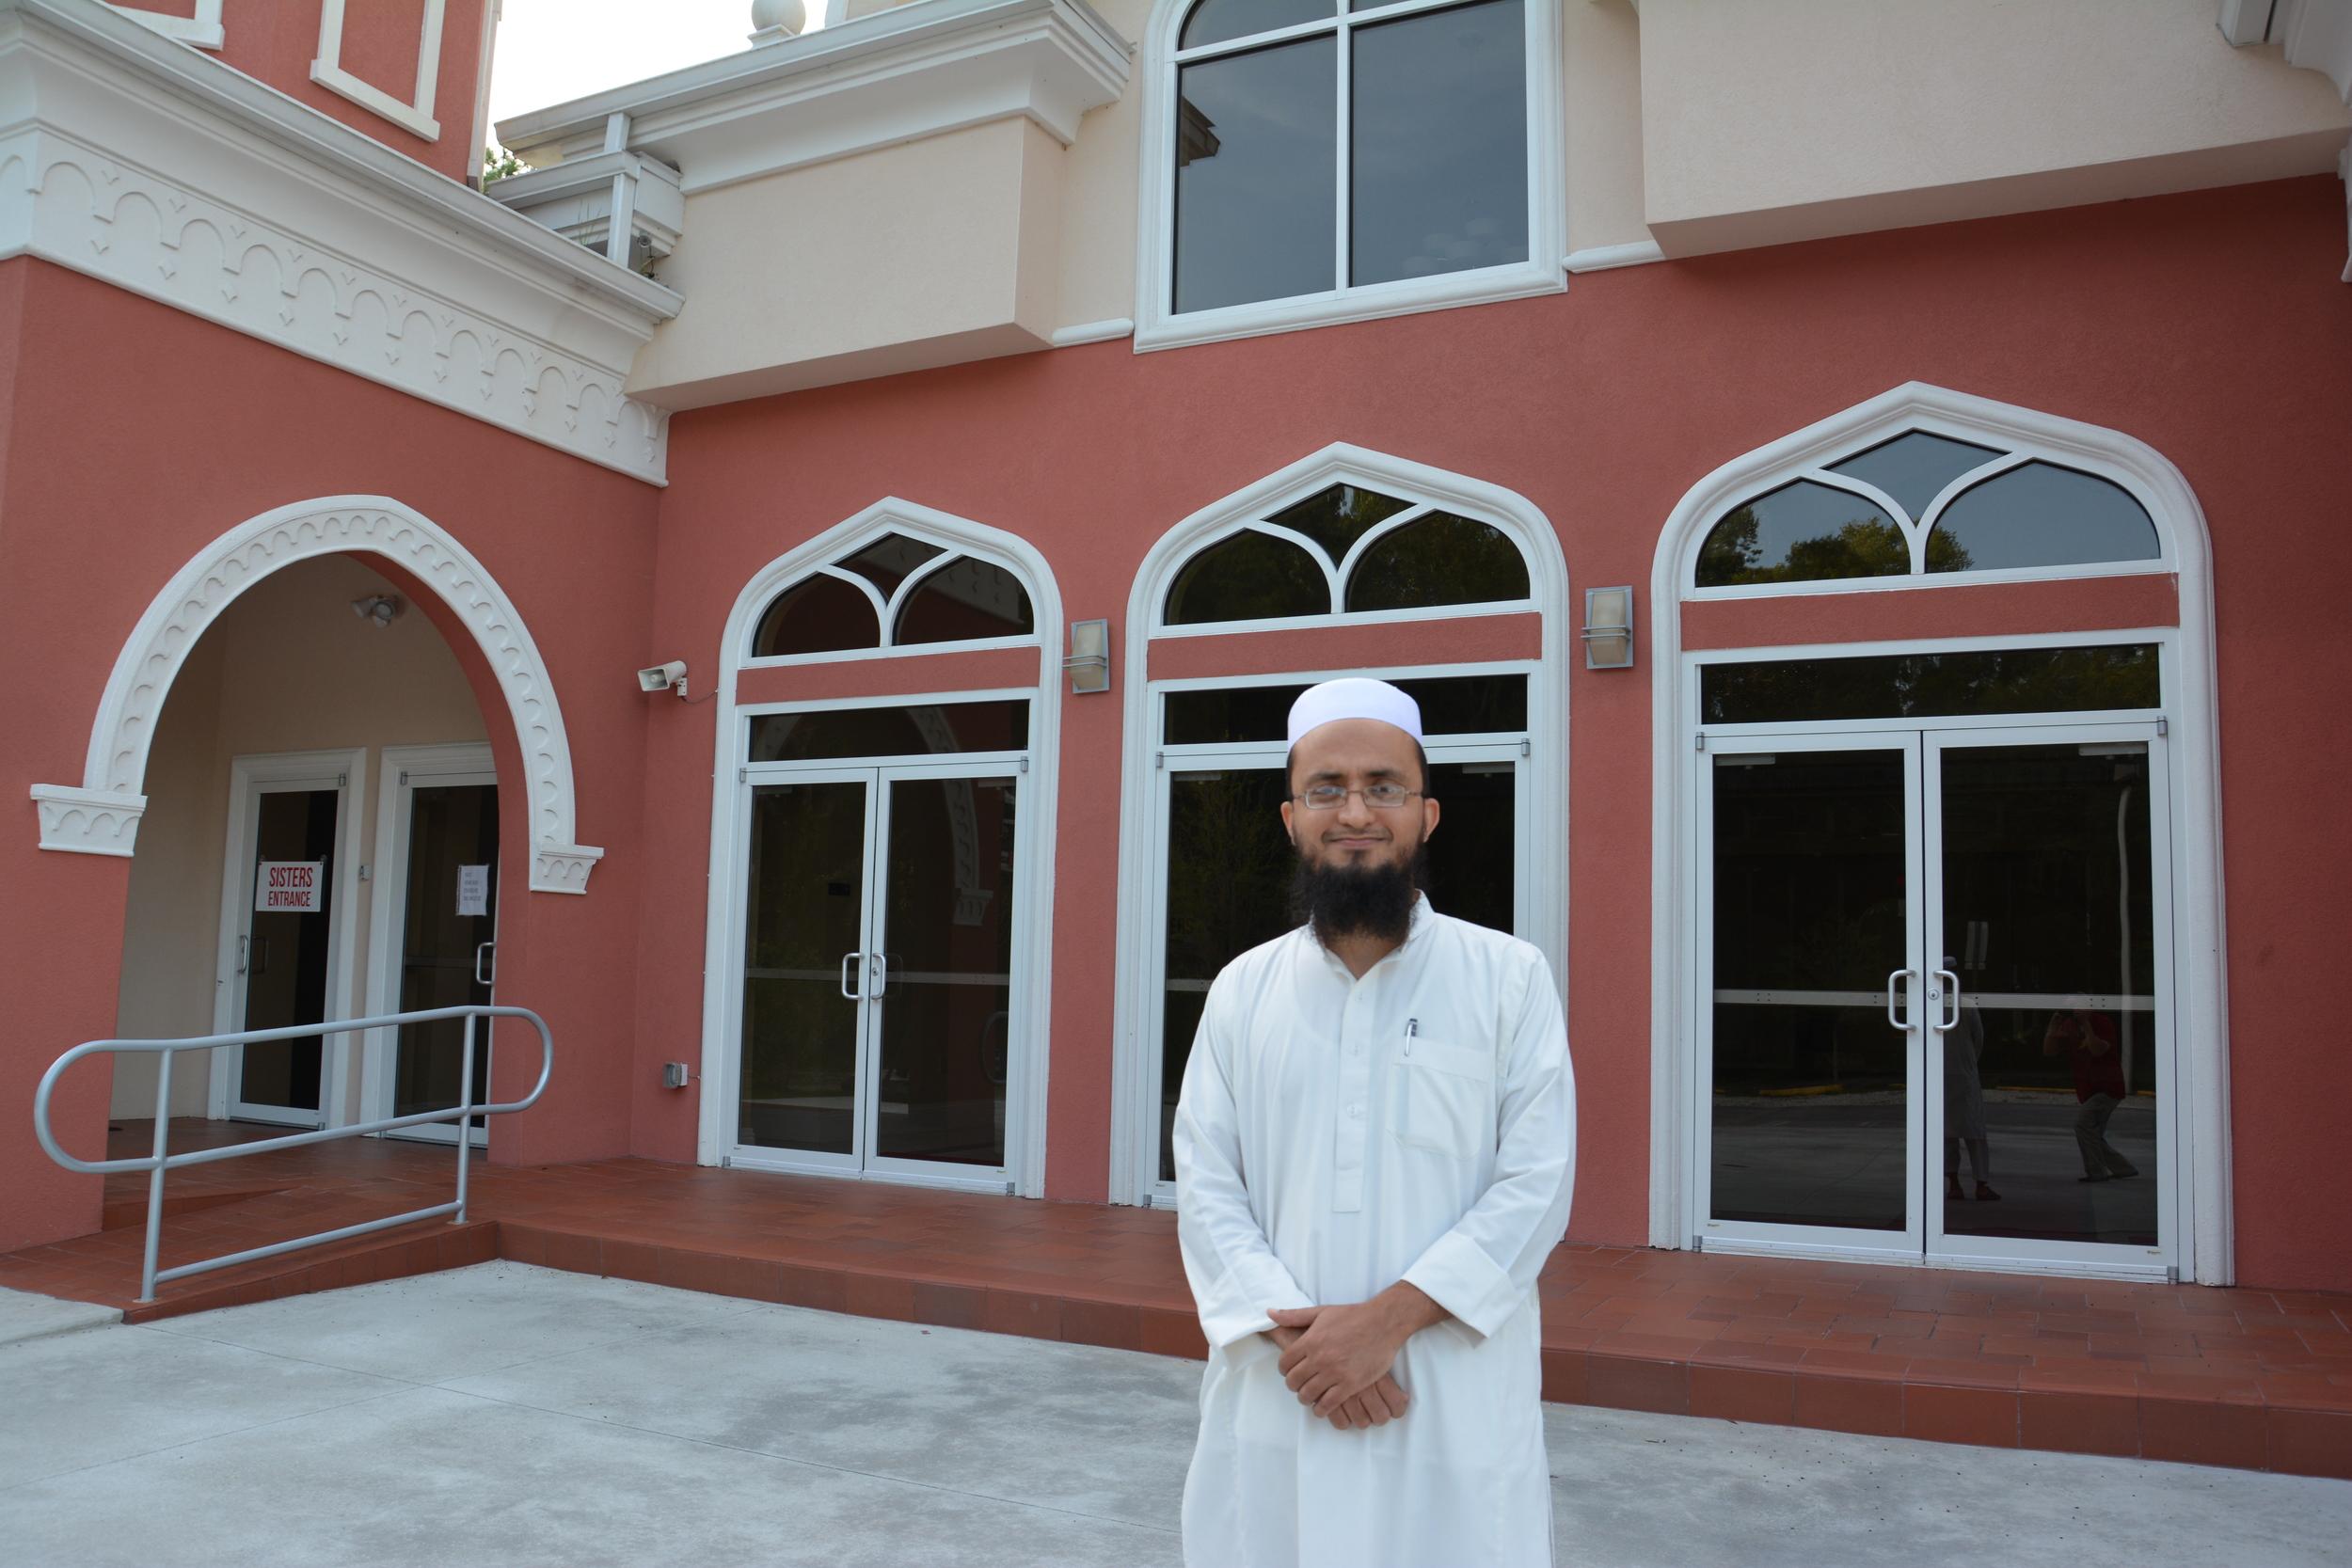 Imam Junaid Khan at the New Tampa Masjid (Daarus Salaam)